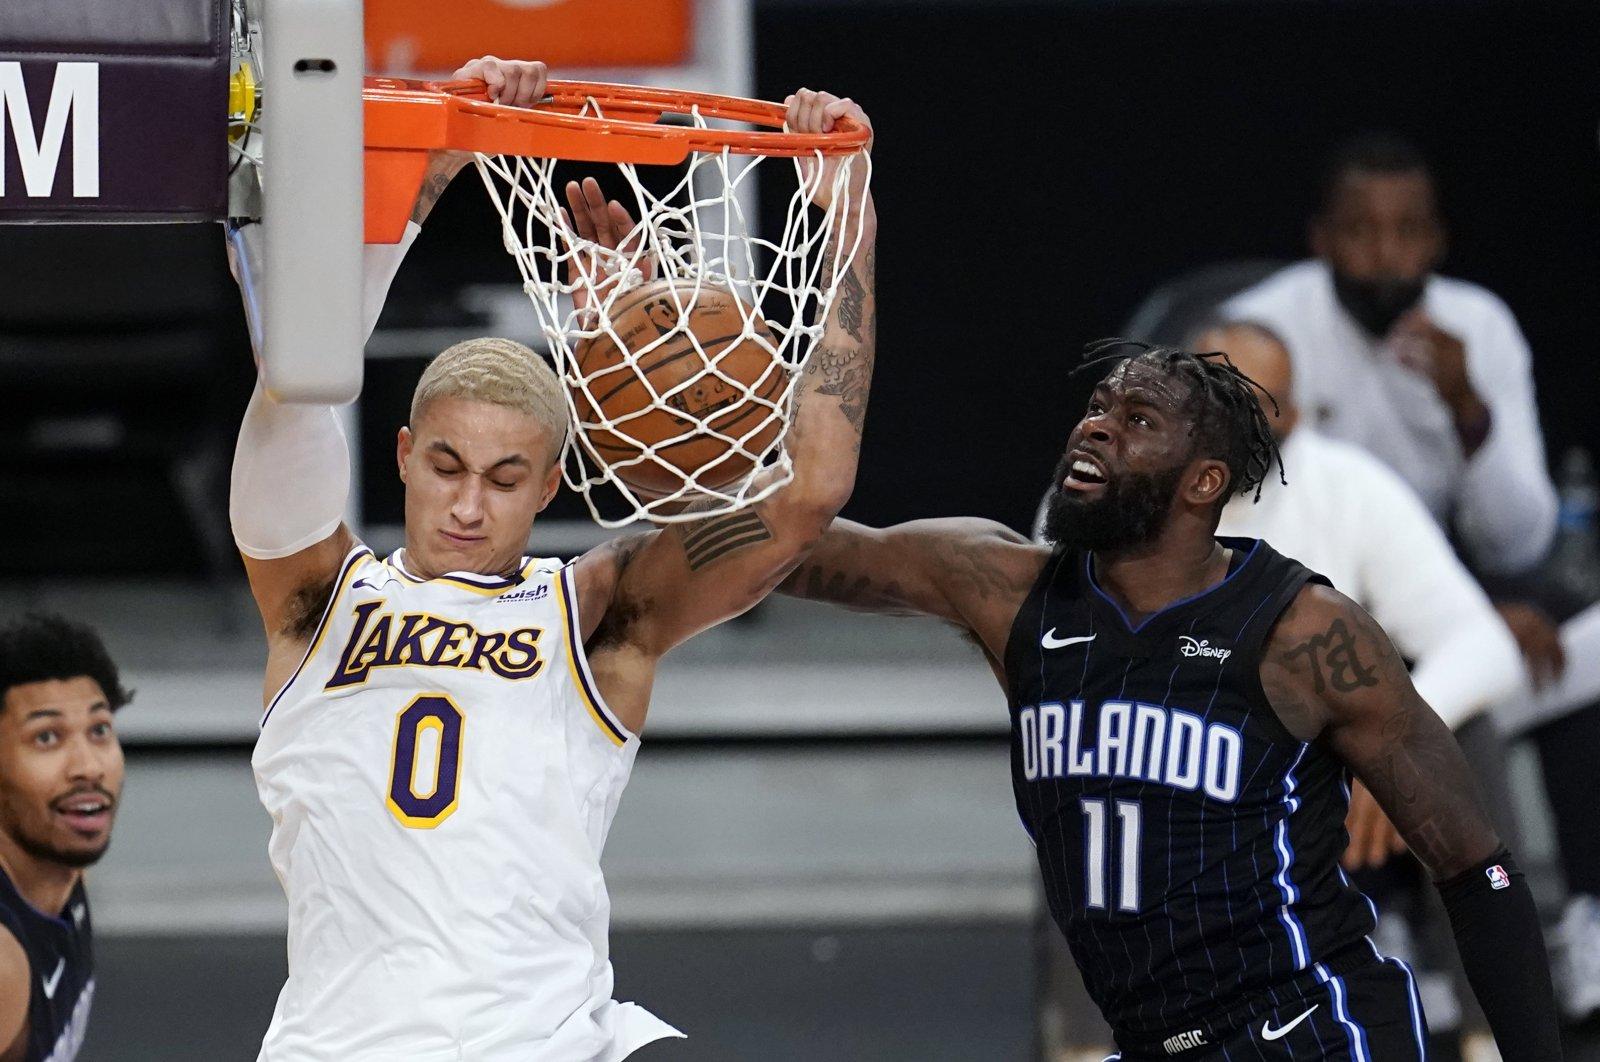 Los Angeles Lakers forward Kyle Kuzma (L) dunks past Orlando Magic forward James Ennis III during an NBA game, Los Angeles, California, U.S., March 28, 2021. (AP Photo)